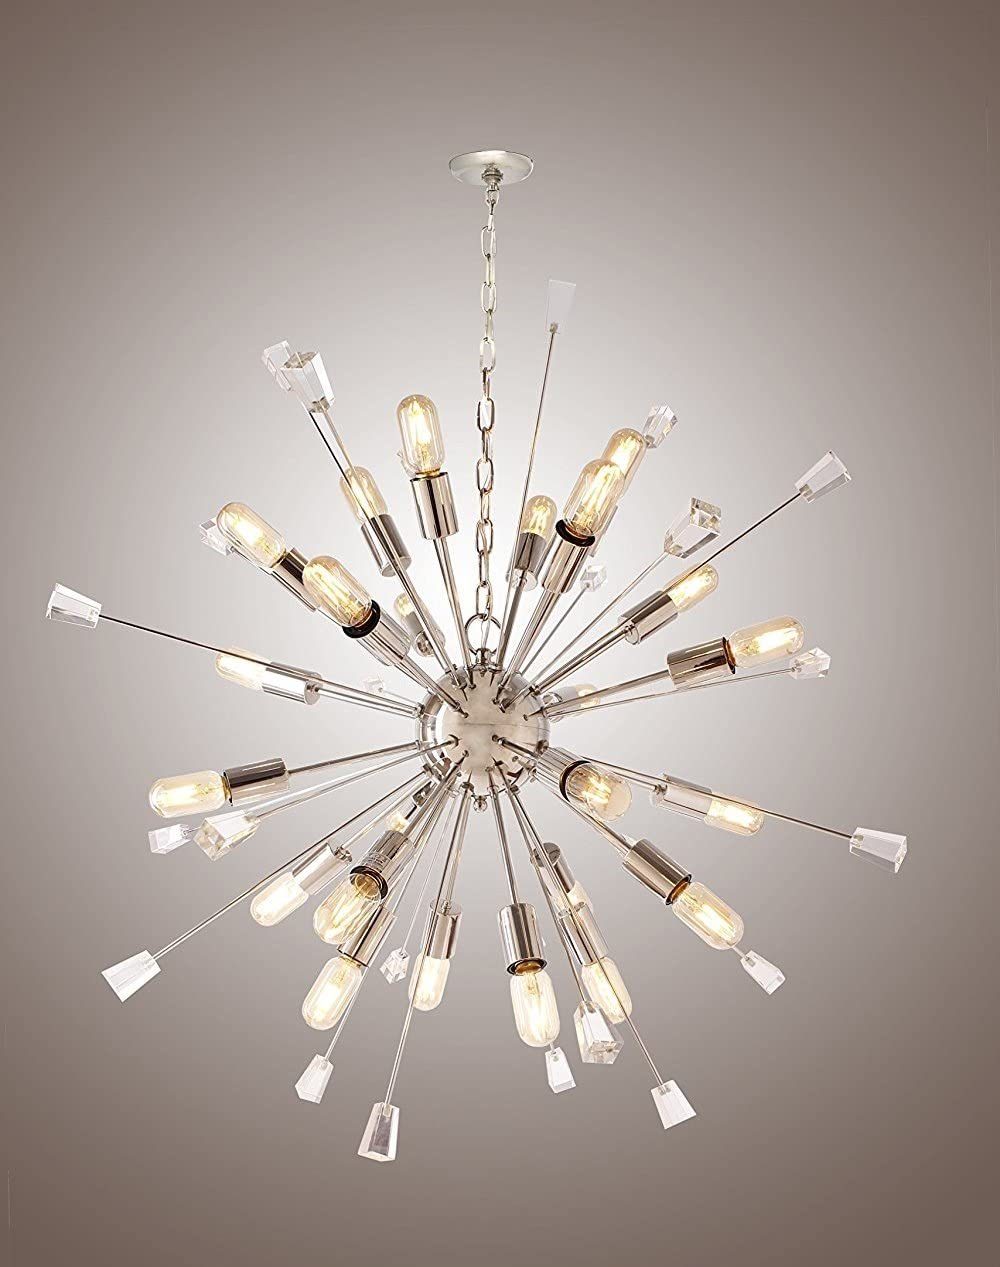 Decomust 40 Large Mid Century Modern Sputnik Light Fixture Italian Starburst Chandelier